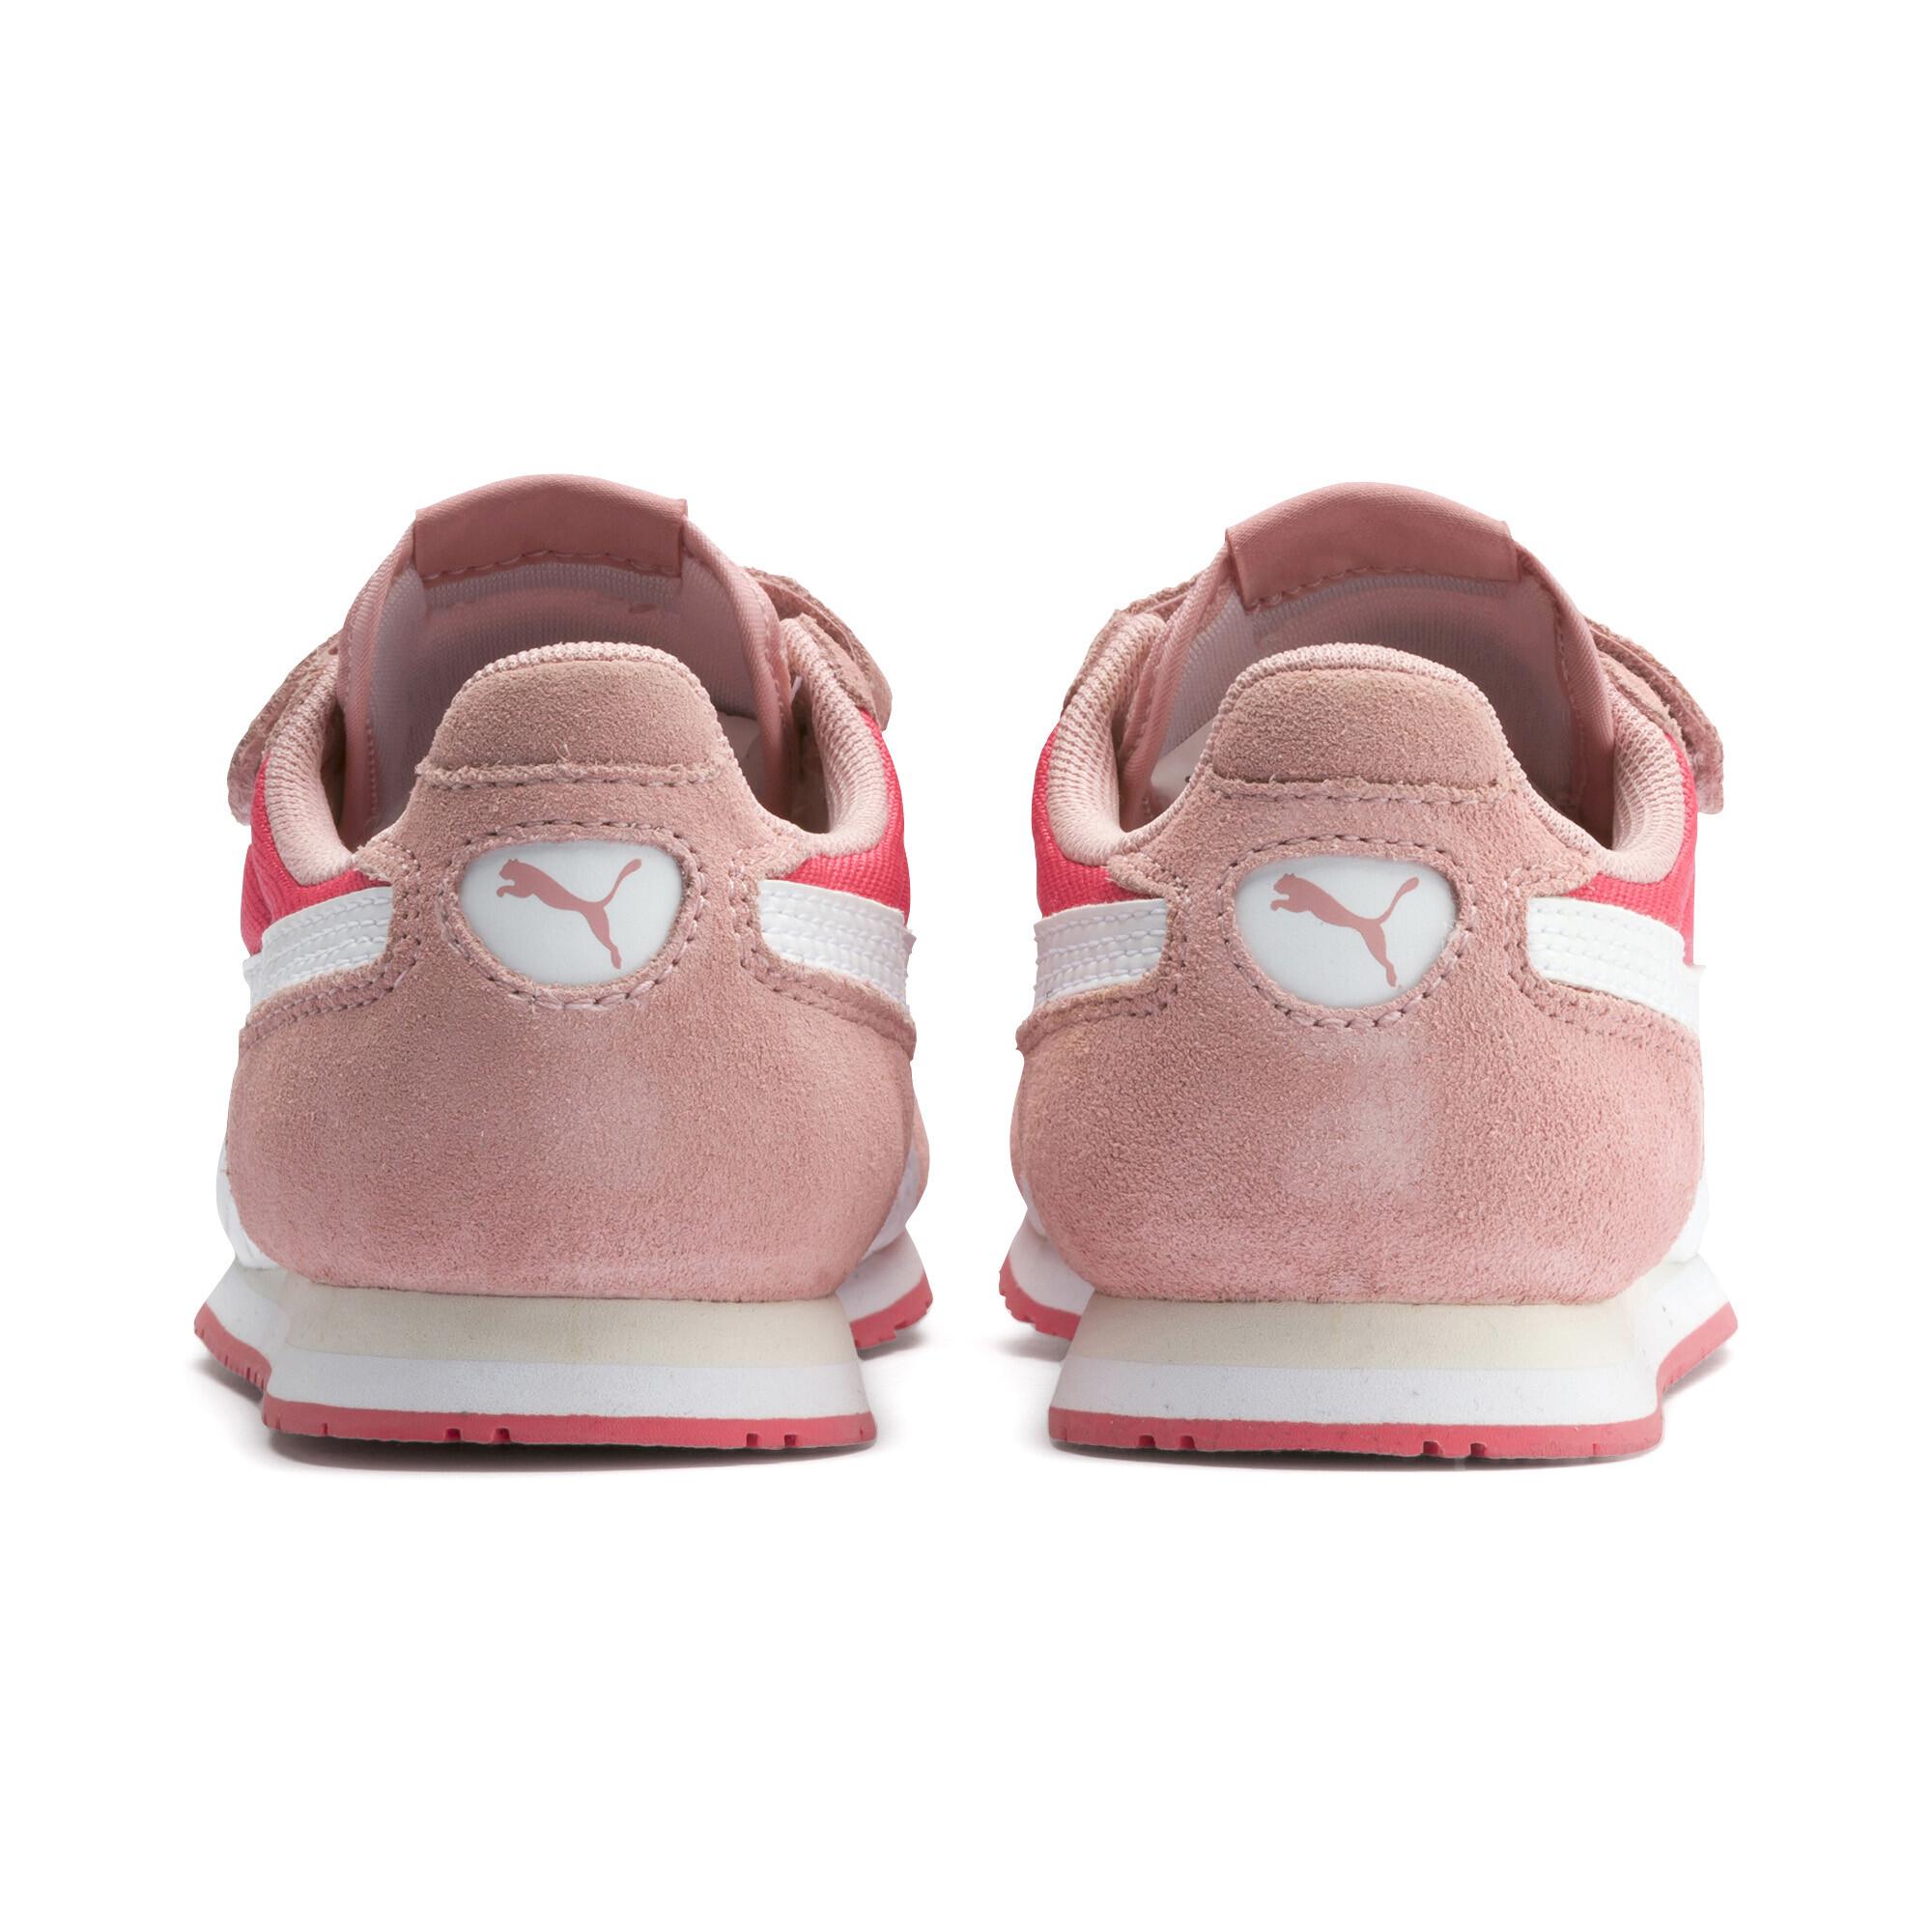 PUMA-Cabana-Racer-Little-Kids-039-Shoes-Kids-Shoe-Kids thumbnail 14